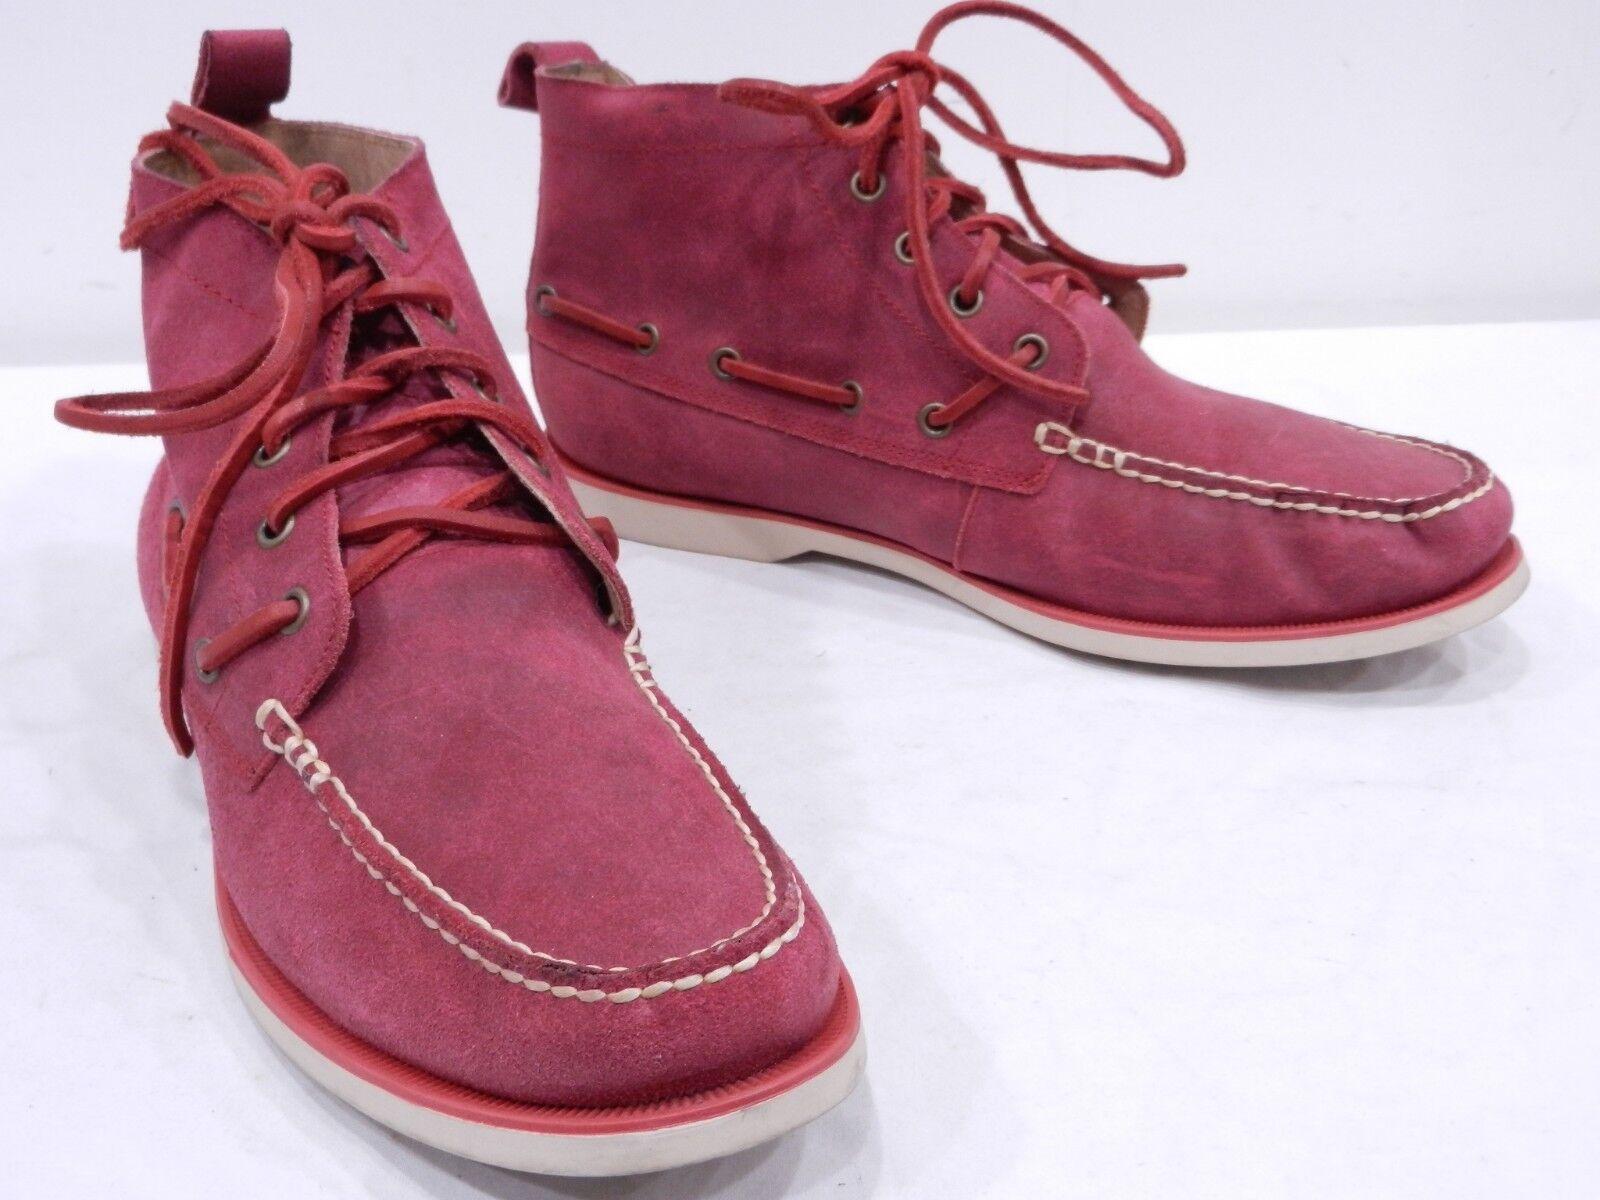 POLO RALPH LAUREN 'Basildon' Mens 10.5 Red Suede Moc Toe Campside Ankle Boots